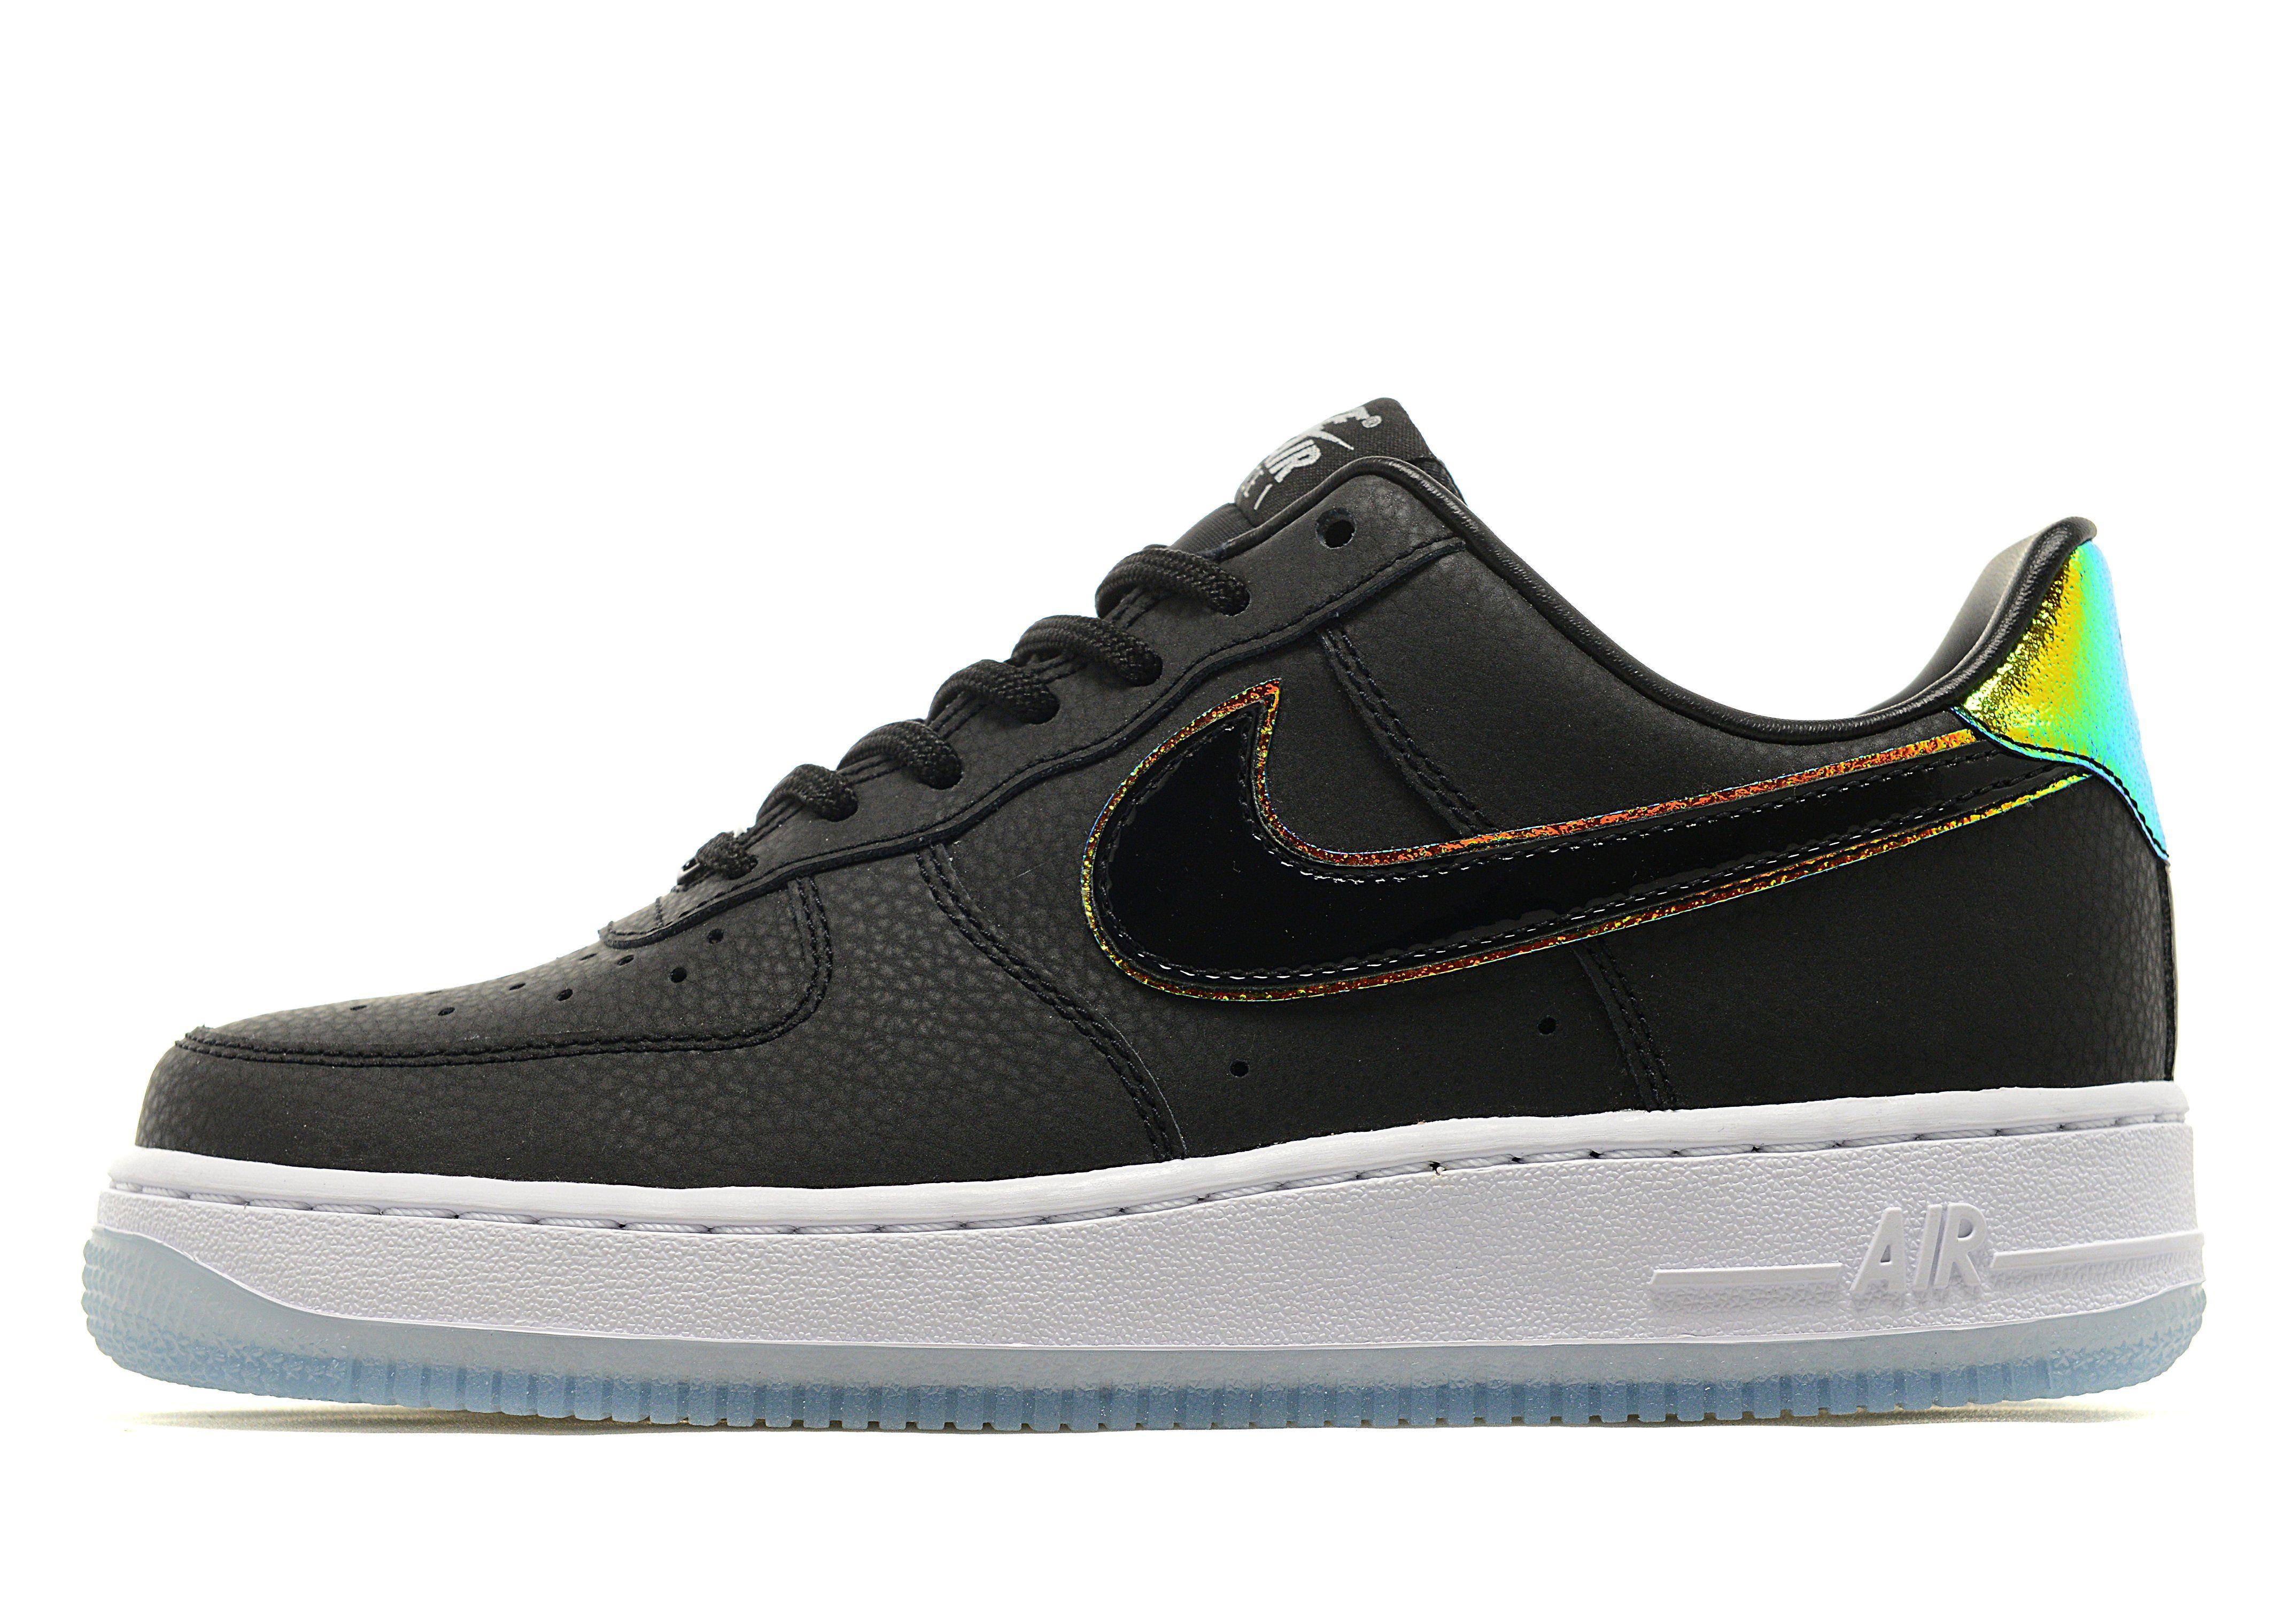 9f9c81e0b1ca5 Nike Air Force 1 Premium Women s